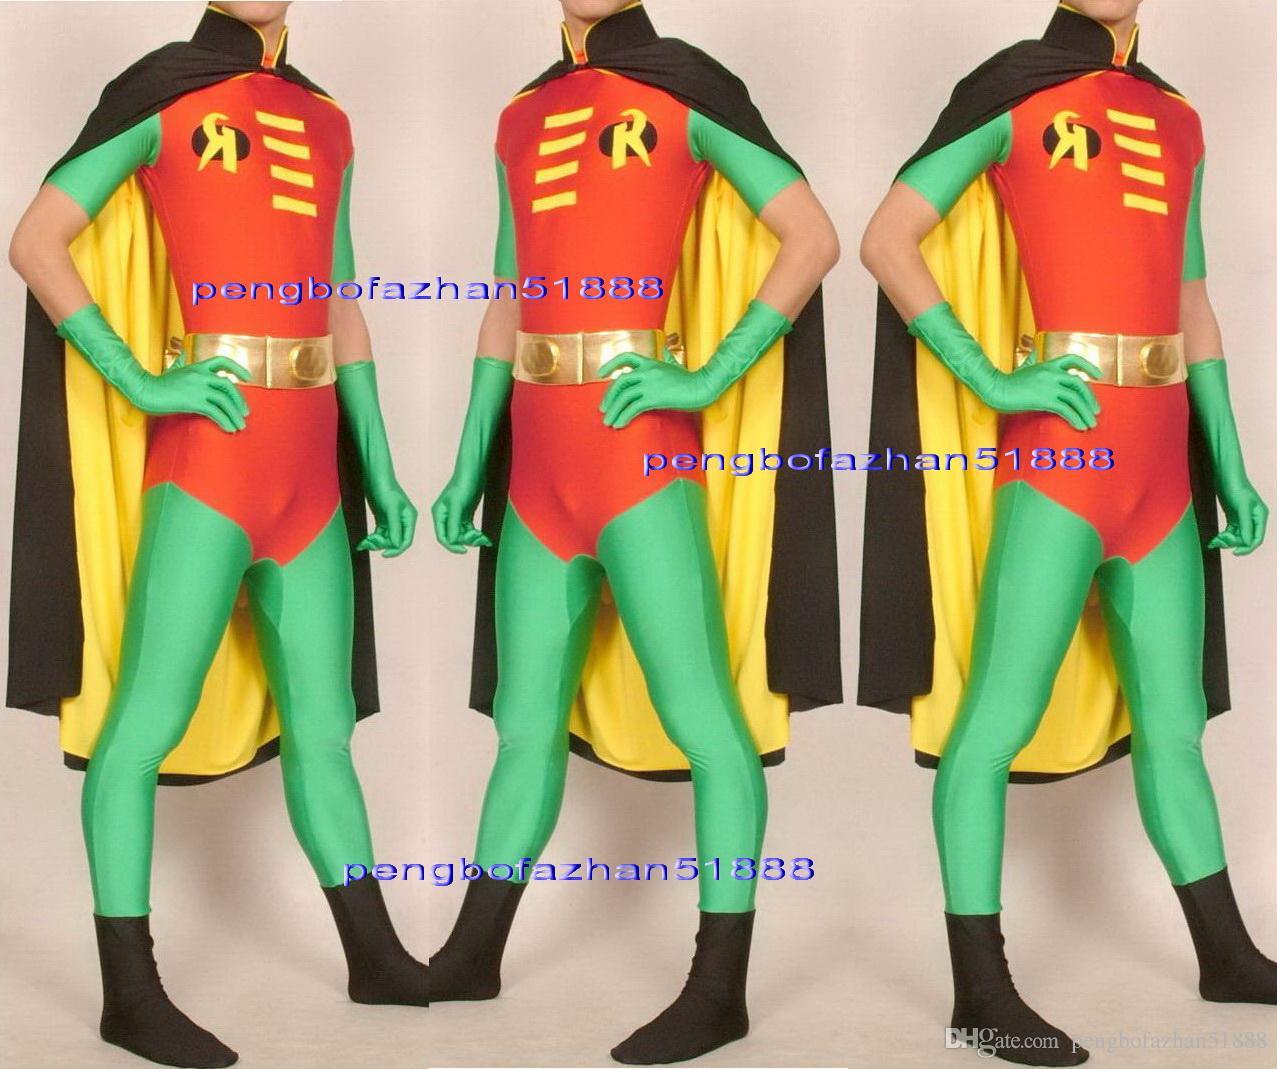 Fantasia Robin Trajes Outfit Lycra Spandex Robin Catsuit Traje Vermelho / Verde Trajes Com Preto / Amarelo Dupla Capa Unisex Super Hero Trajes P082